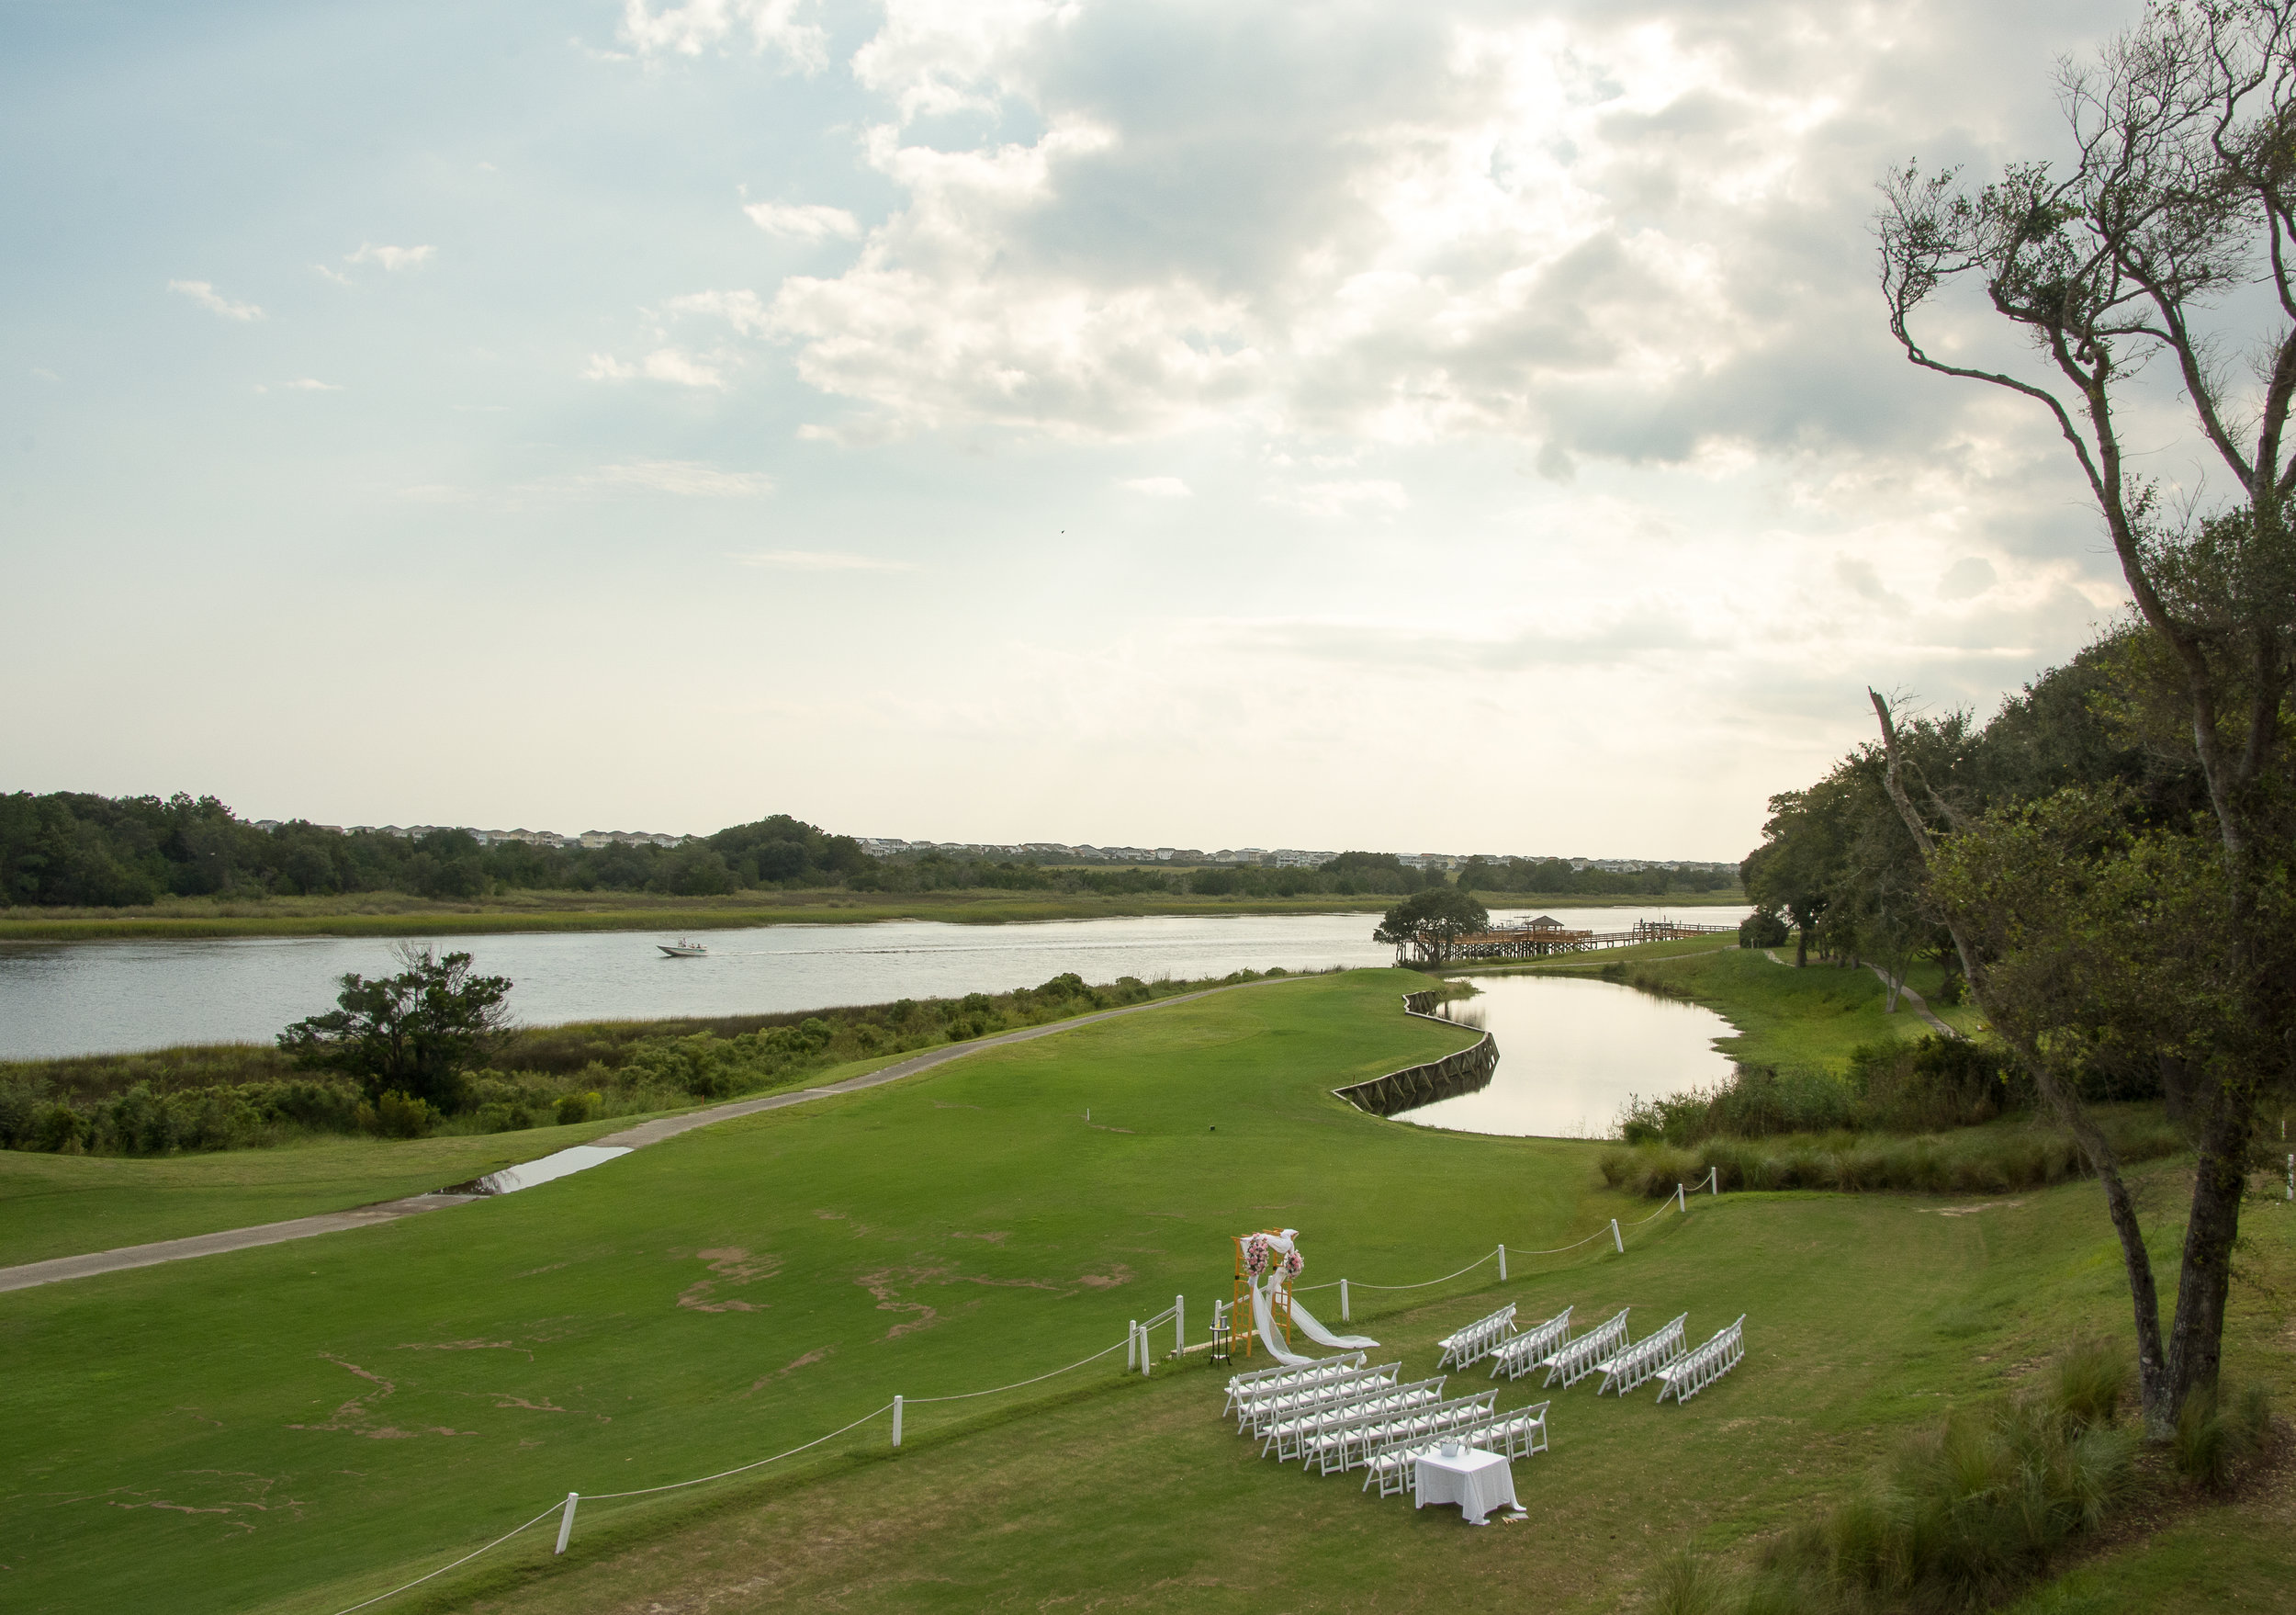 - Beautiful fairway wedding ceremony set up overlooking intracoastal waterway.